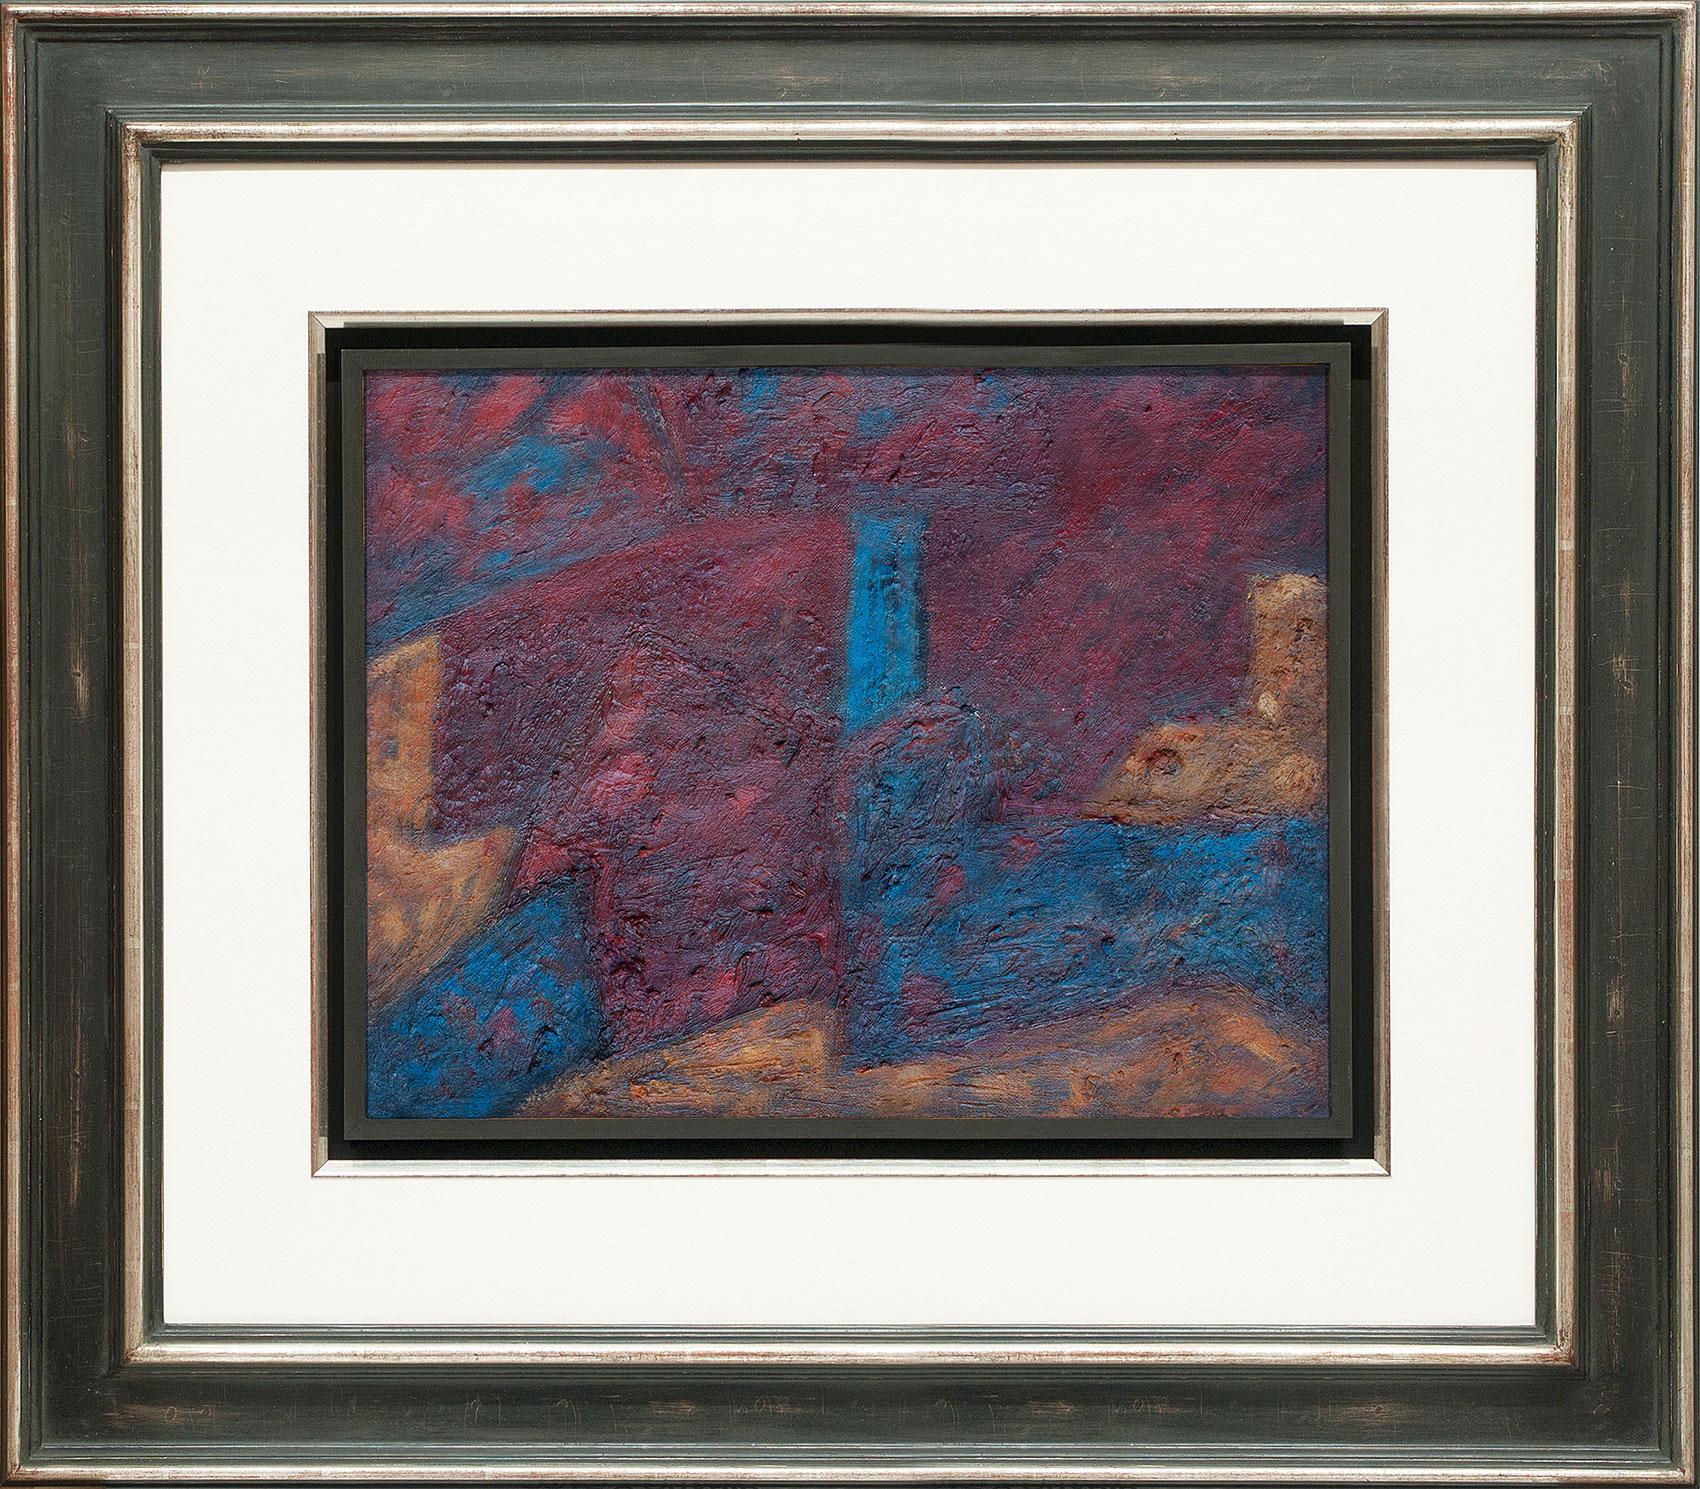 Serge Poliakoff, Composition ocre rouge et bleu, Galerie Française